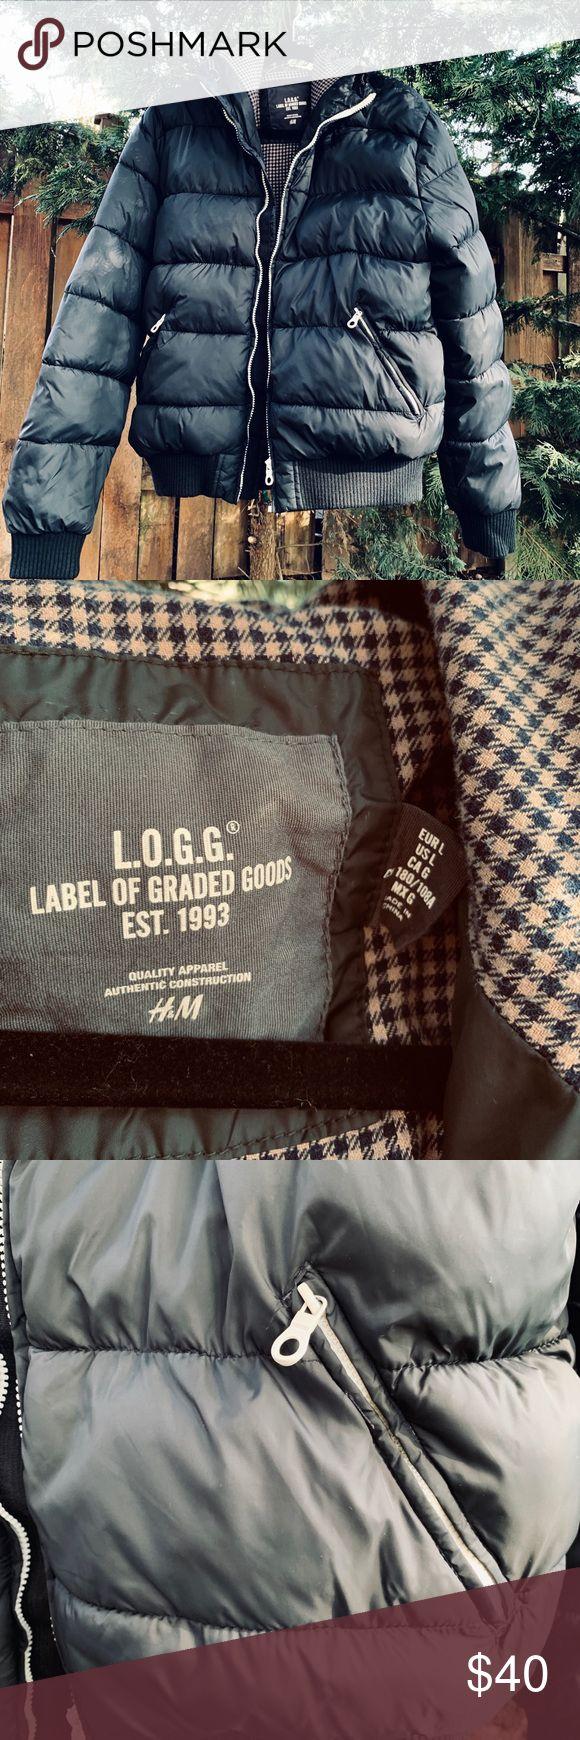 Men's H&M Black Hooded Puffer Jacket Sz L Puffer jackets